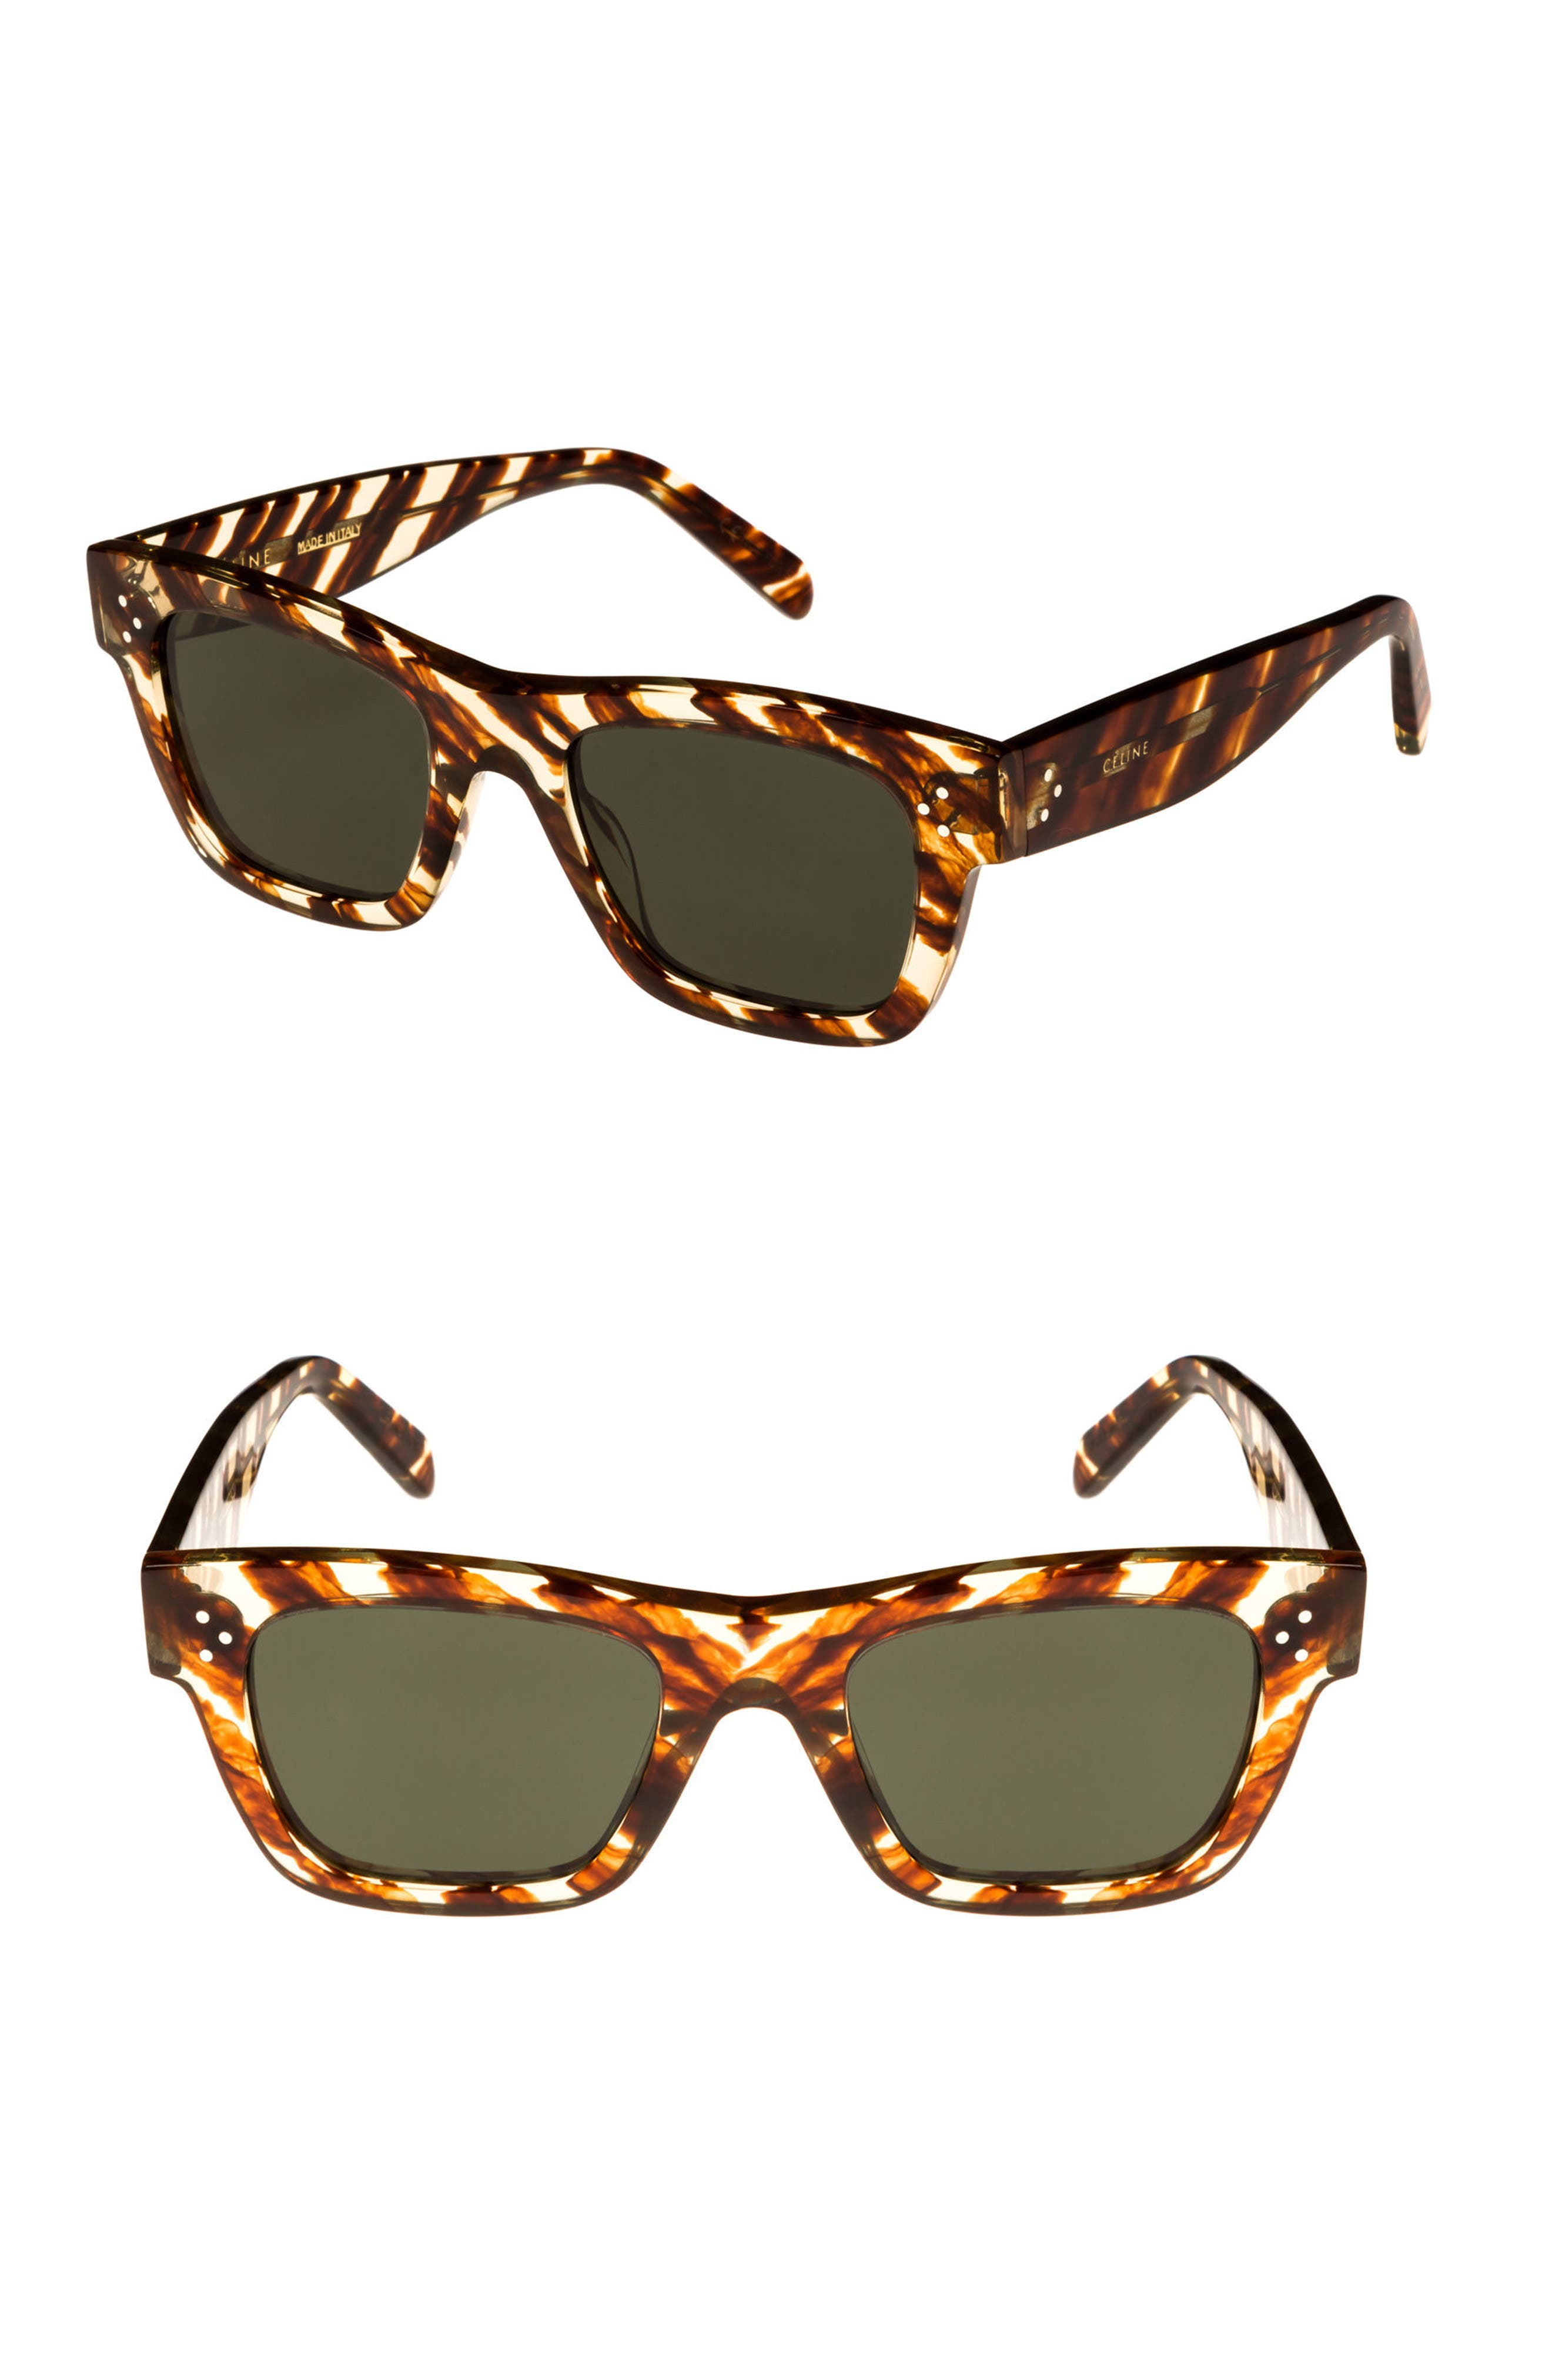 51mm Rectangular Sunglasses,                         Main,                         color, STRIPED COGNAC HAVANA/ GREEN